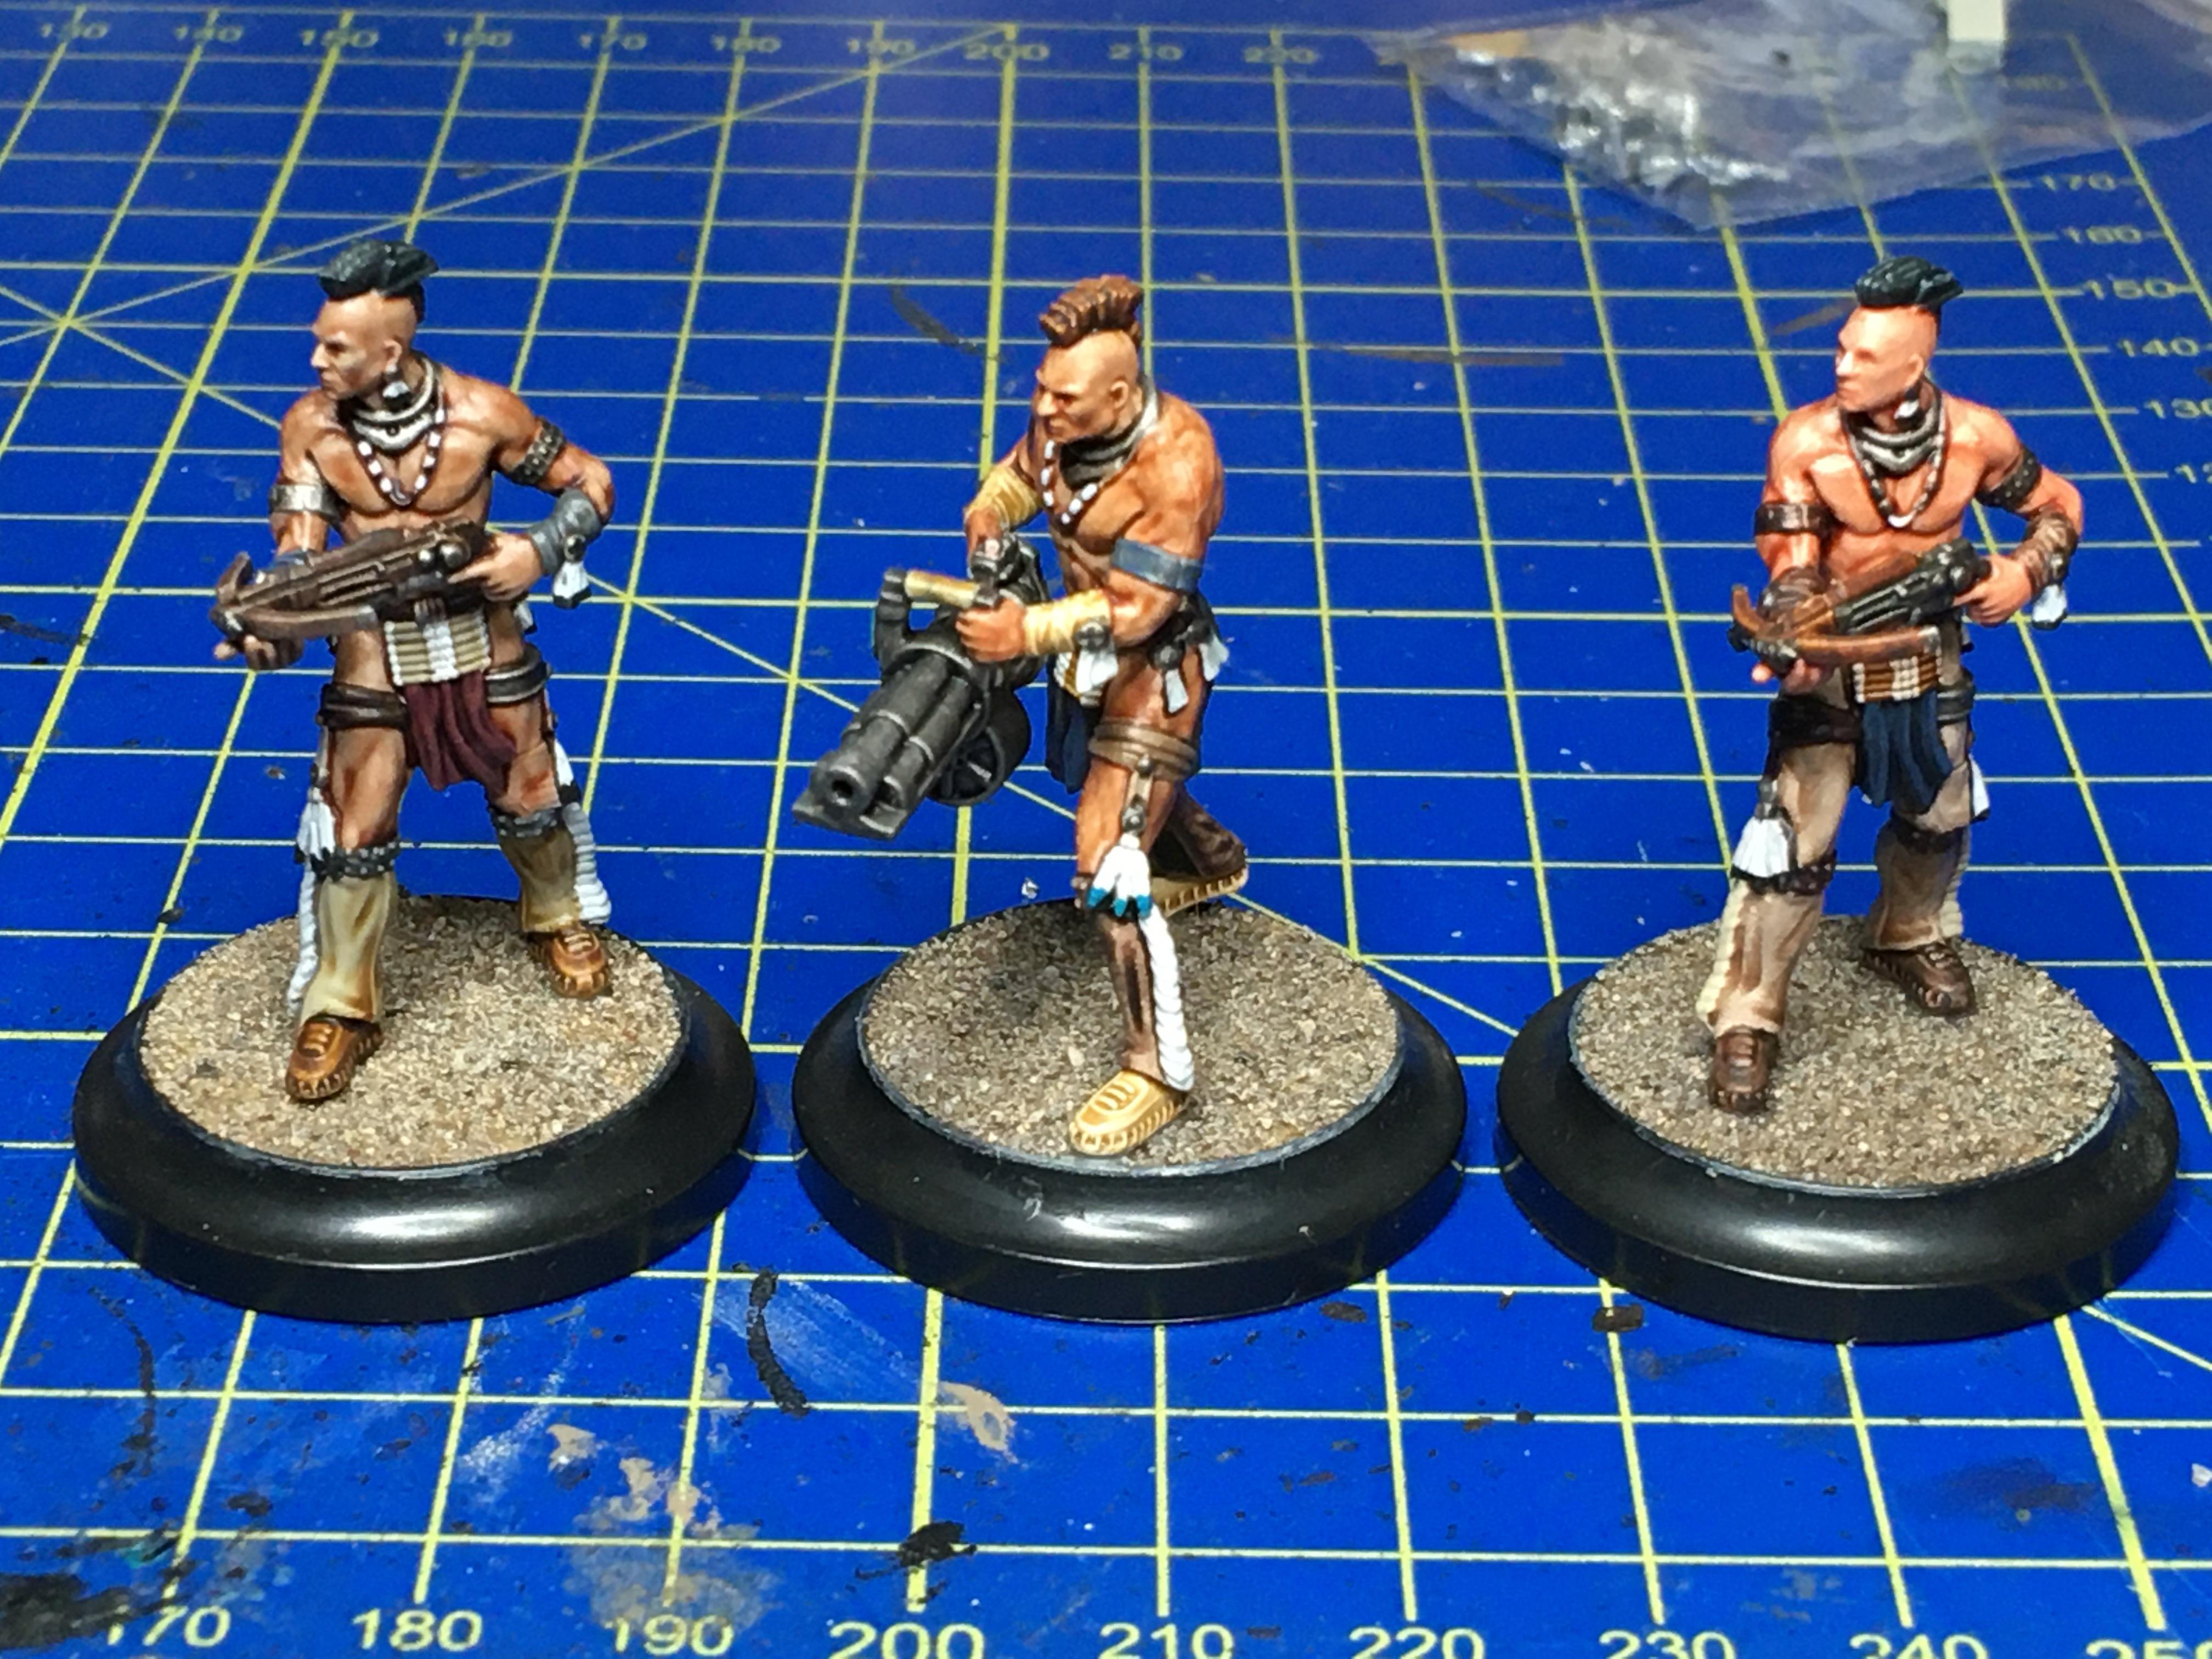 Kaga Brothers, Warrior Nation, Wild West Exodus, Wwe